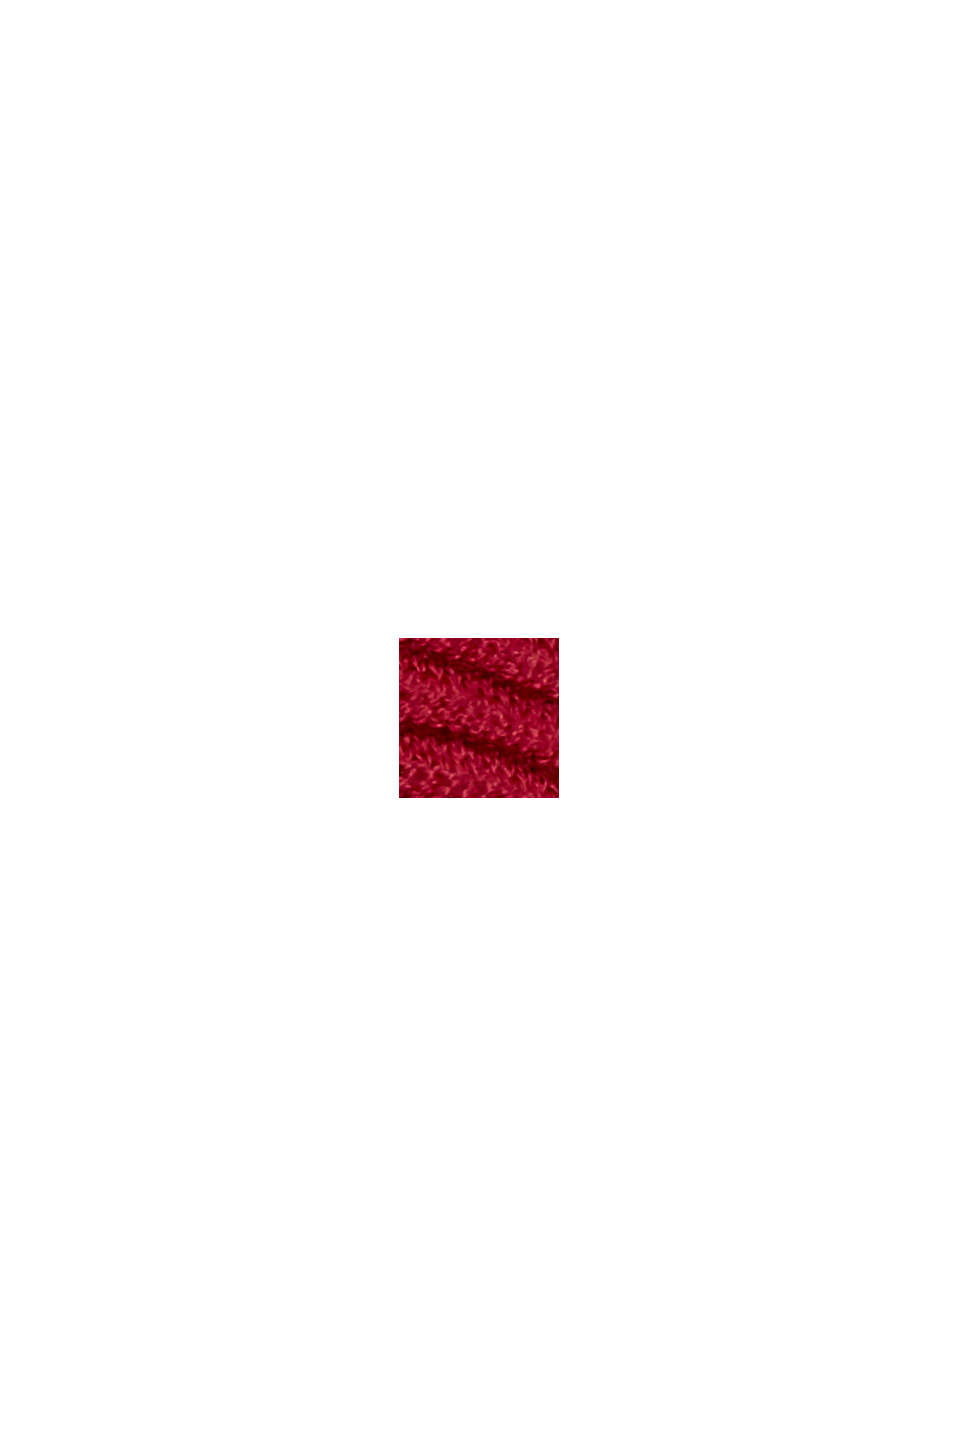 Geribde trui met kraag met tunnelkoord, katoen, DARK RED, swatch